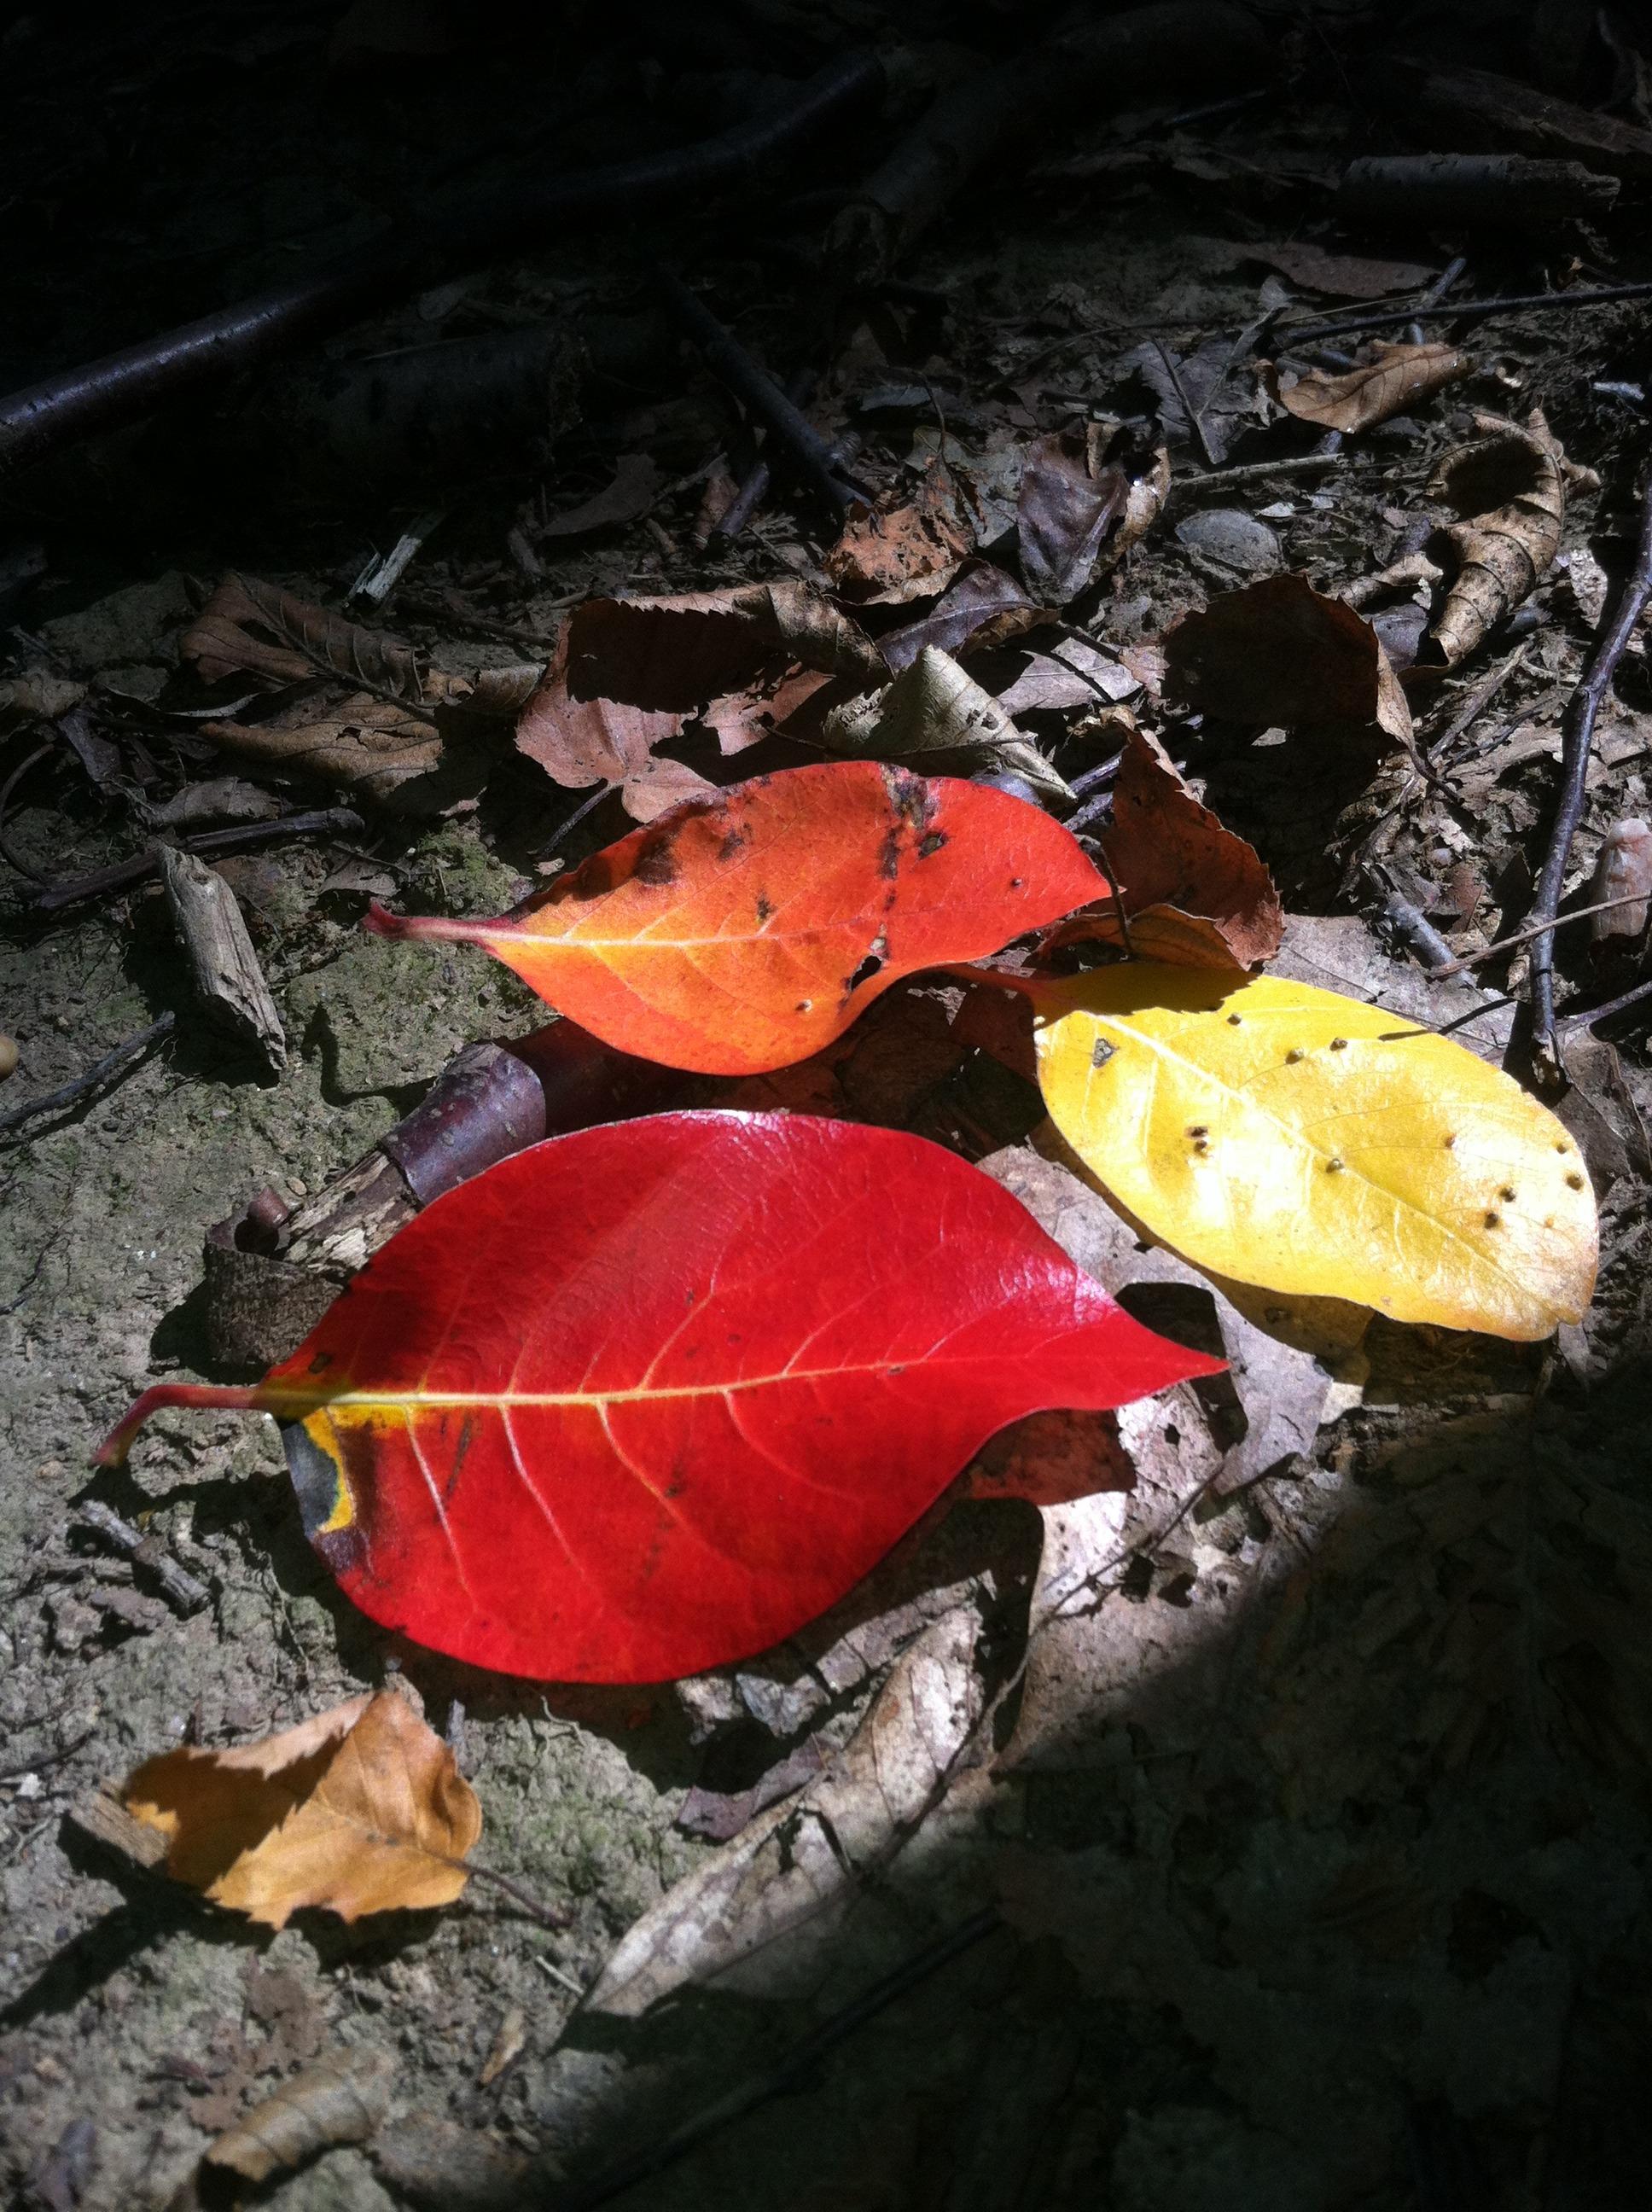 a6b5763e98ba7fdadc04_Photo_workshop_2_Nov_8_-_fall_colors.JPG